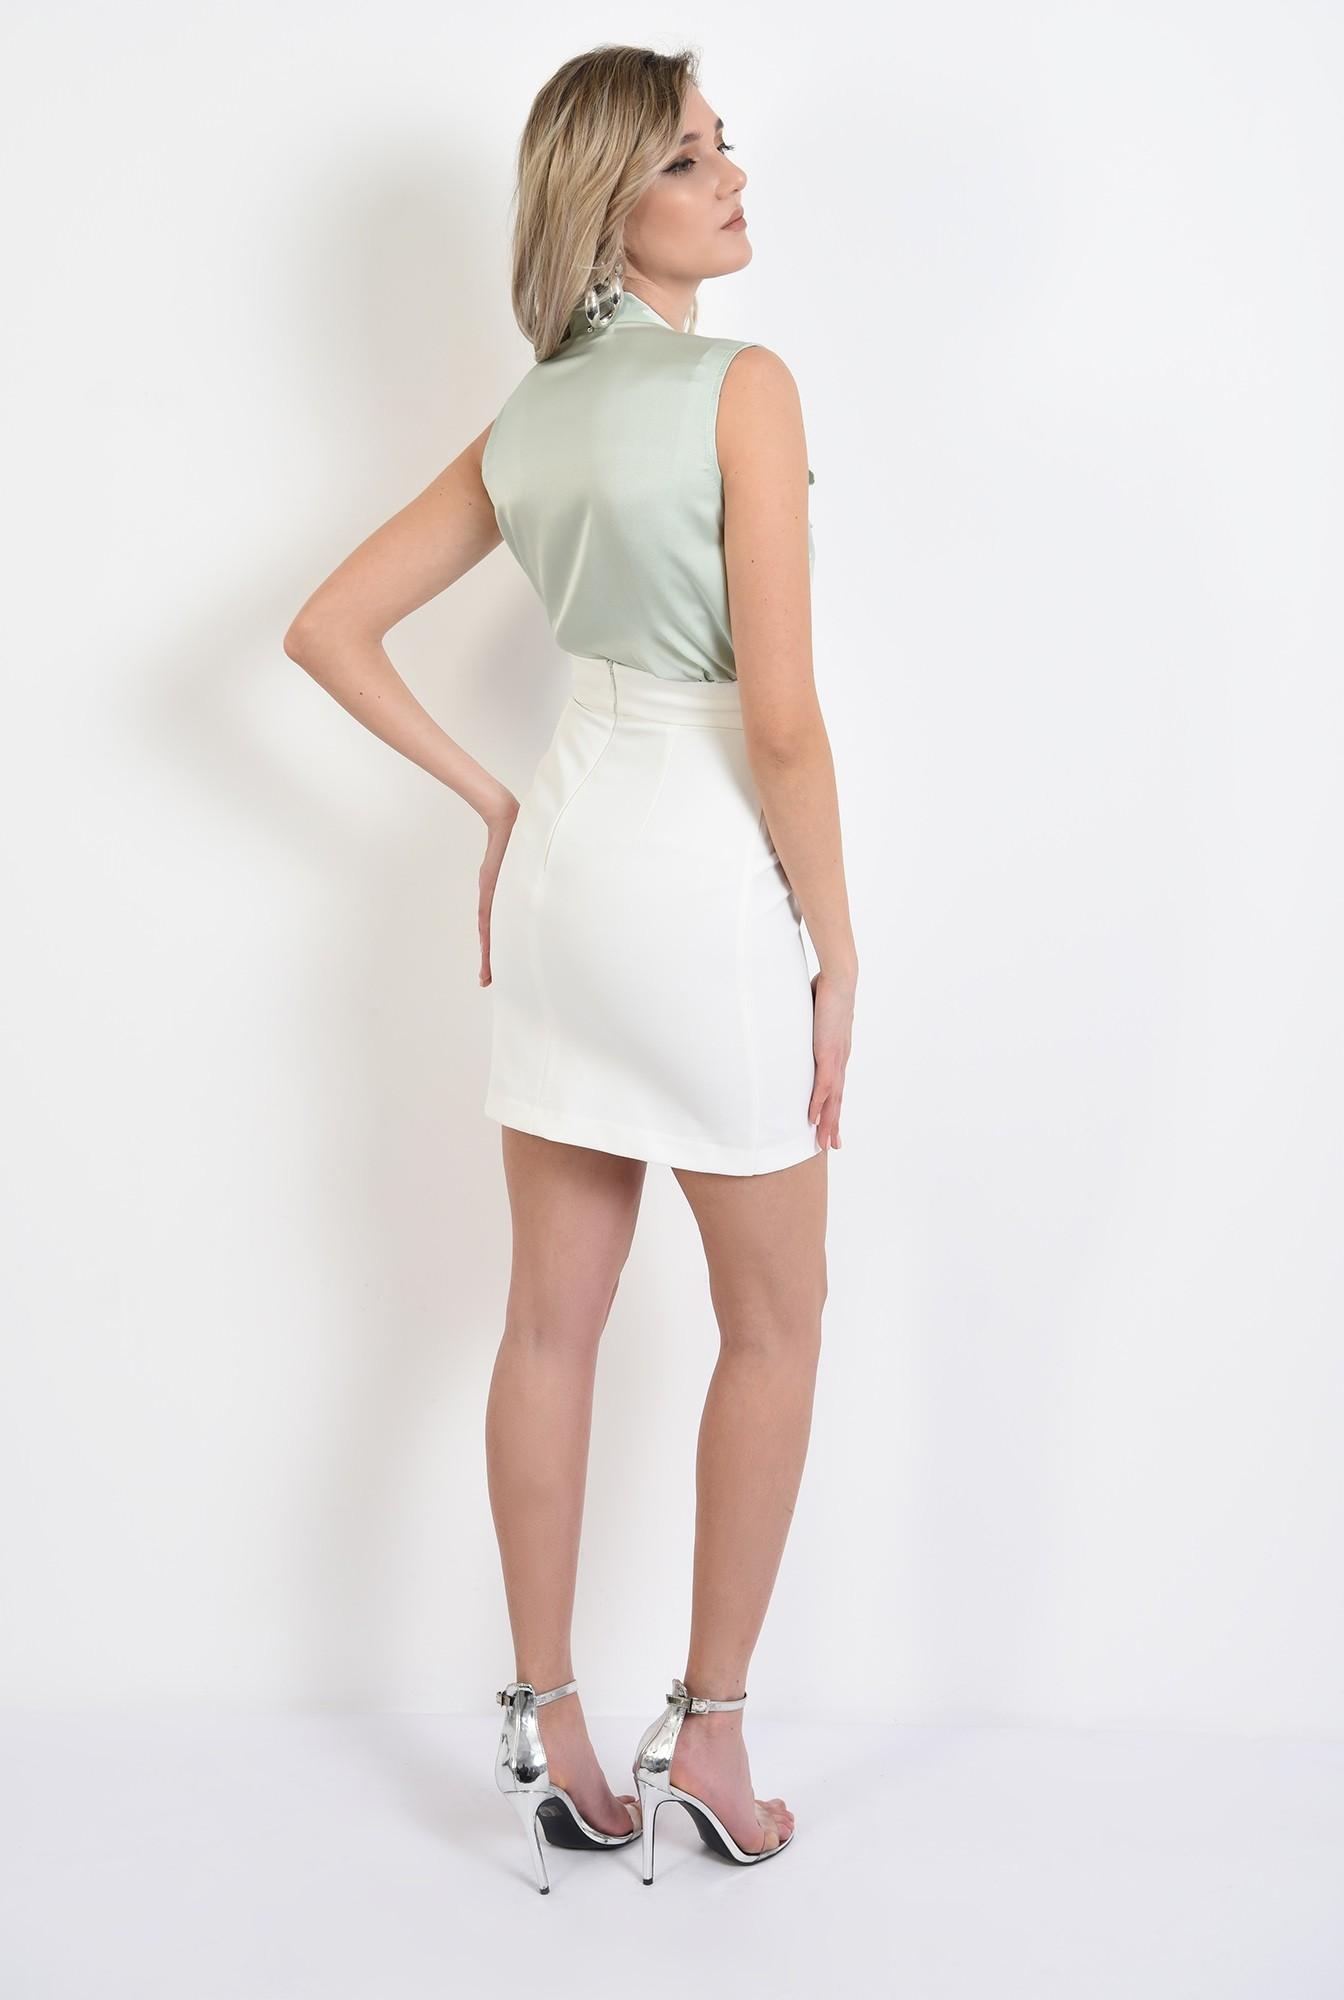 1 -  bluza eleganta, fara maneci, din satin, cu funda laterala